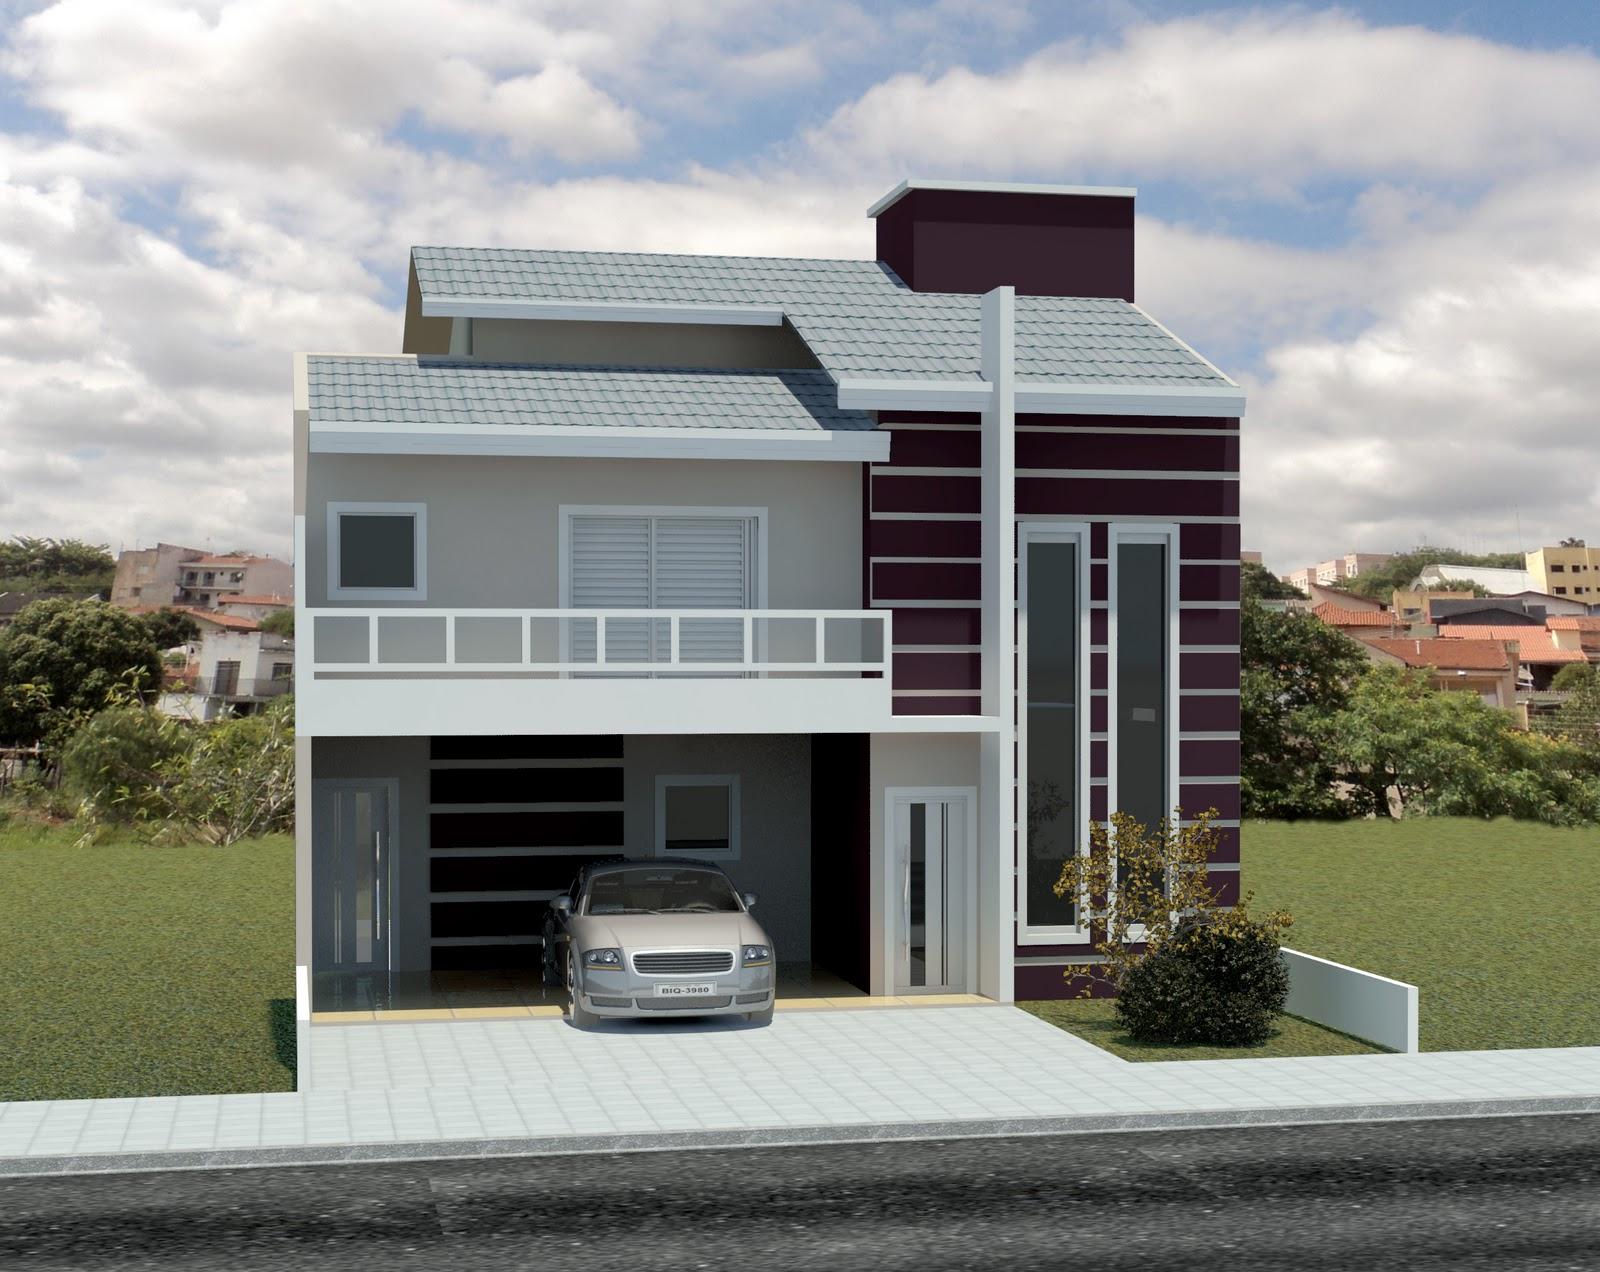 Imagens de #865F45  de Projetos: Projeto e Fachada Frontal desenvolvida para Eng. Henrique 1600x1272 px 3408 Bloco Cad Banheiro Vista Frontal